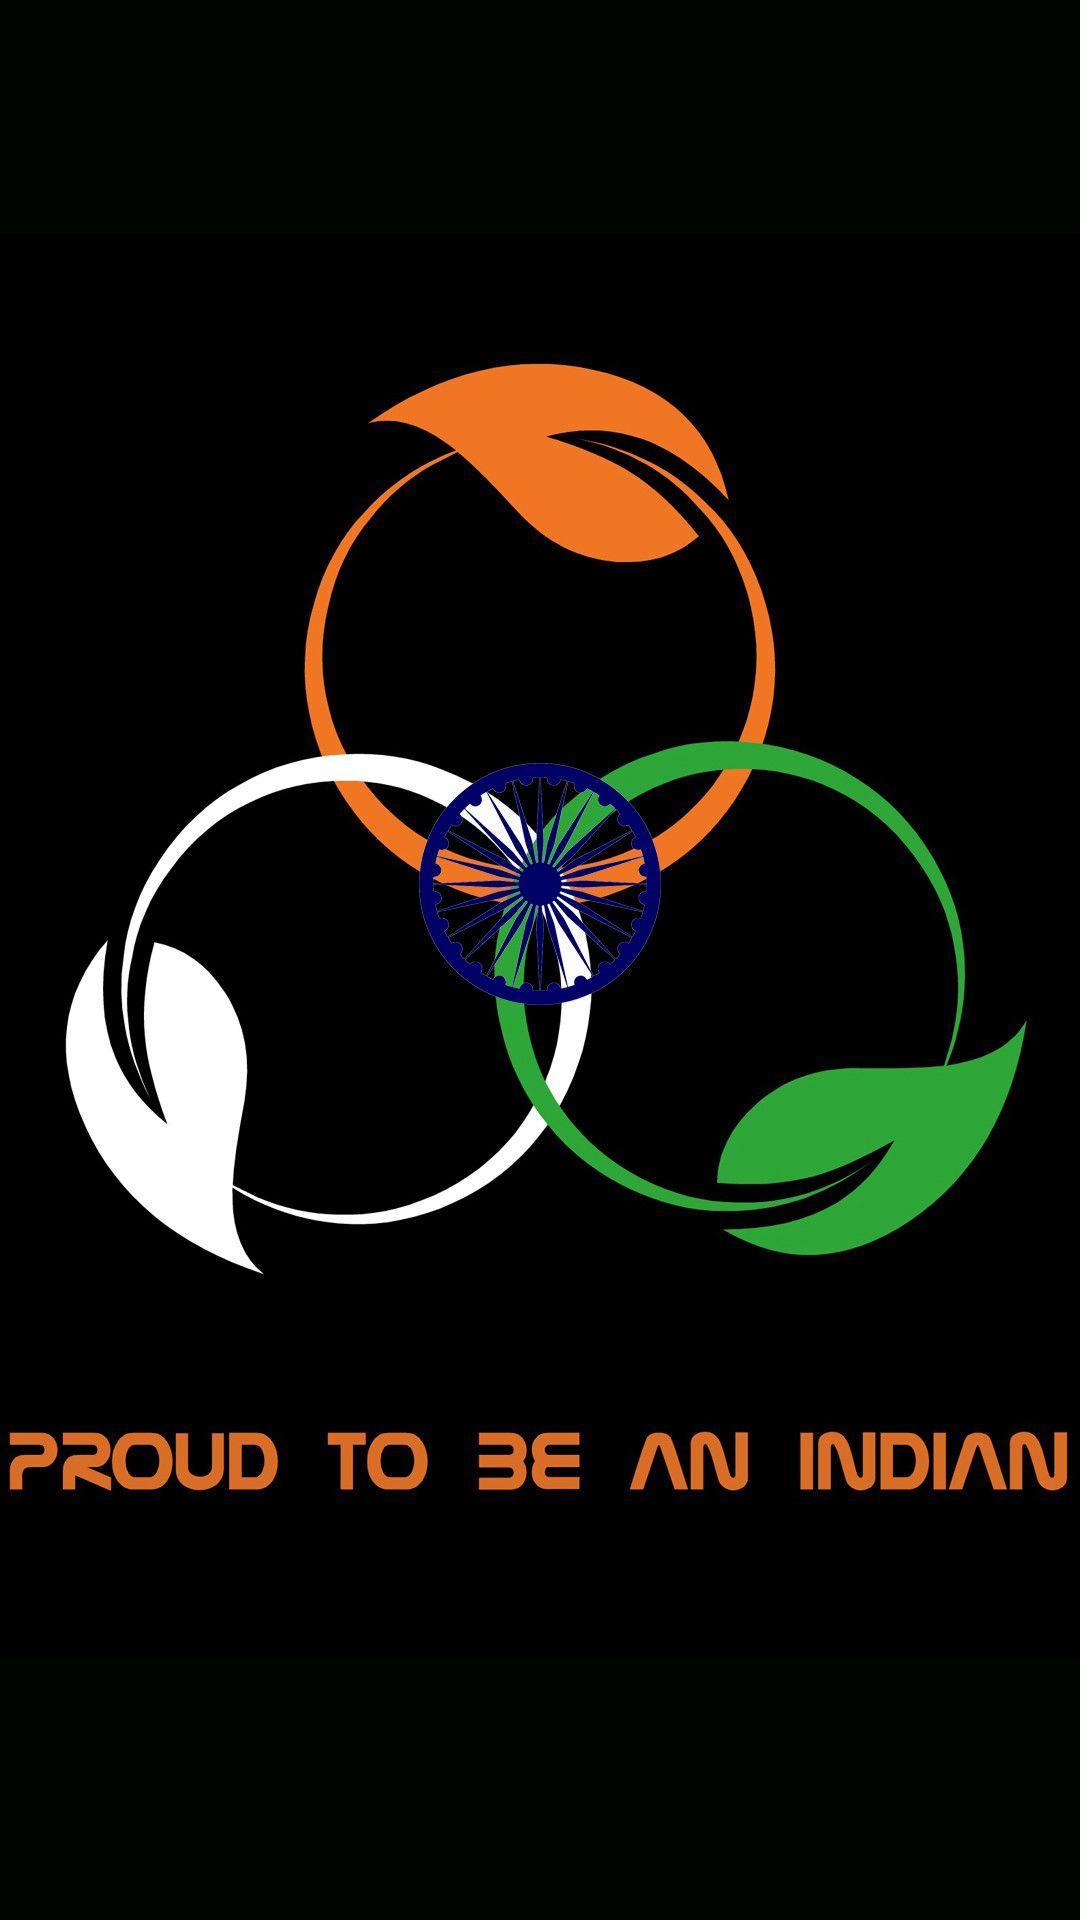 India Flag Photo 2018 Tekirdagvincfirmalari